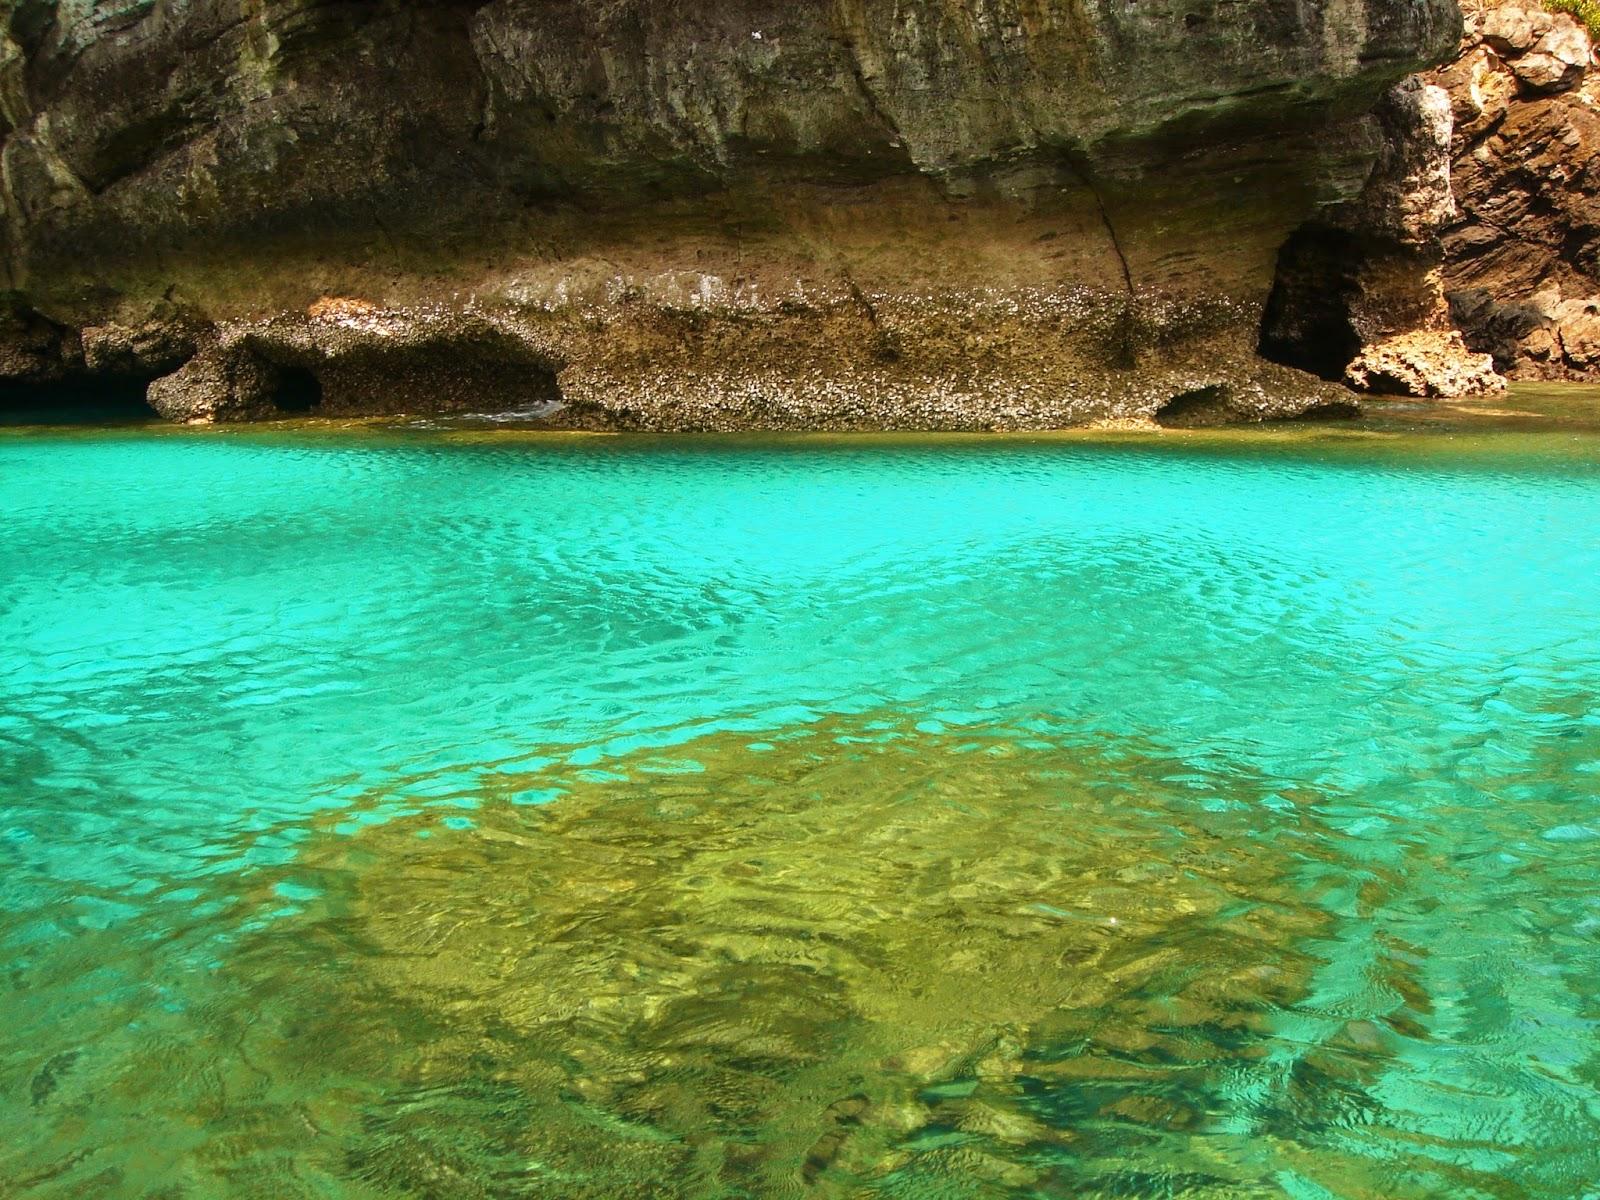 phi-phi-island-thailand-beach-asia-